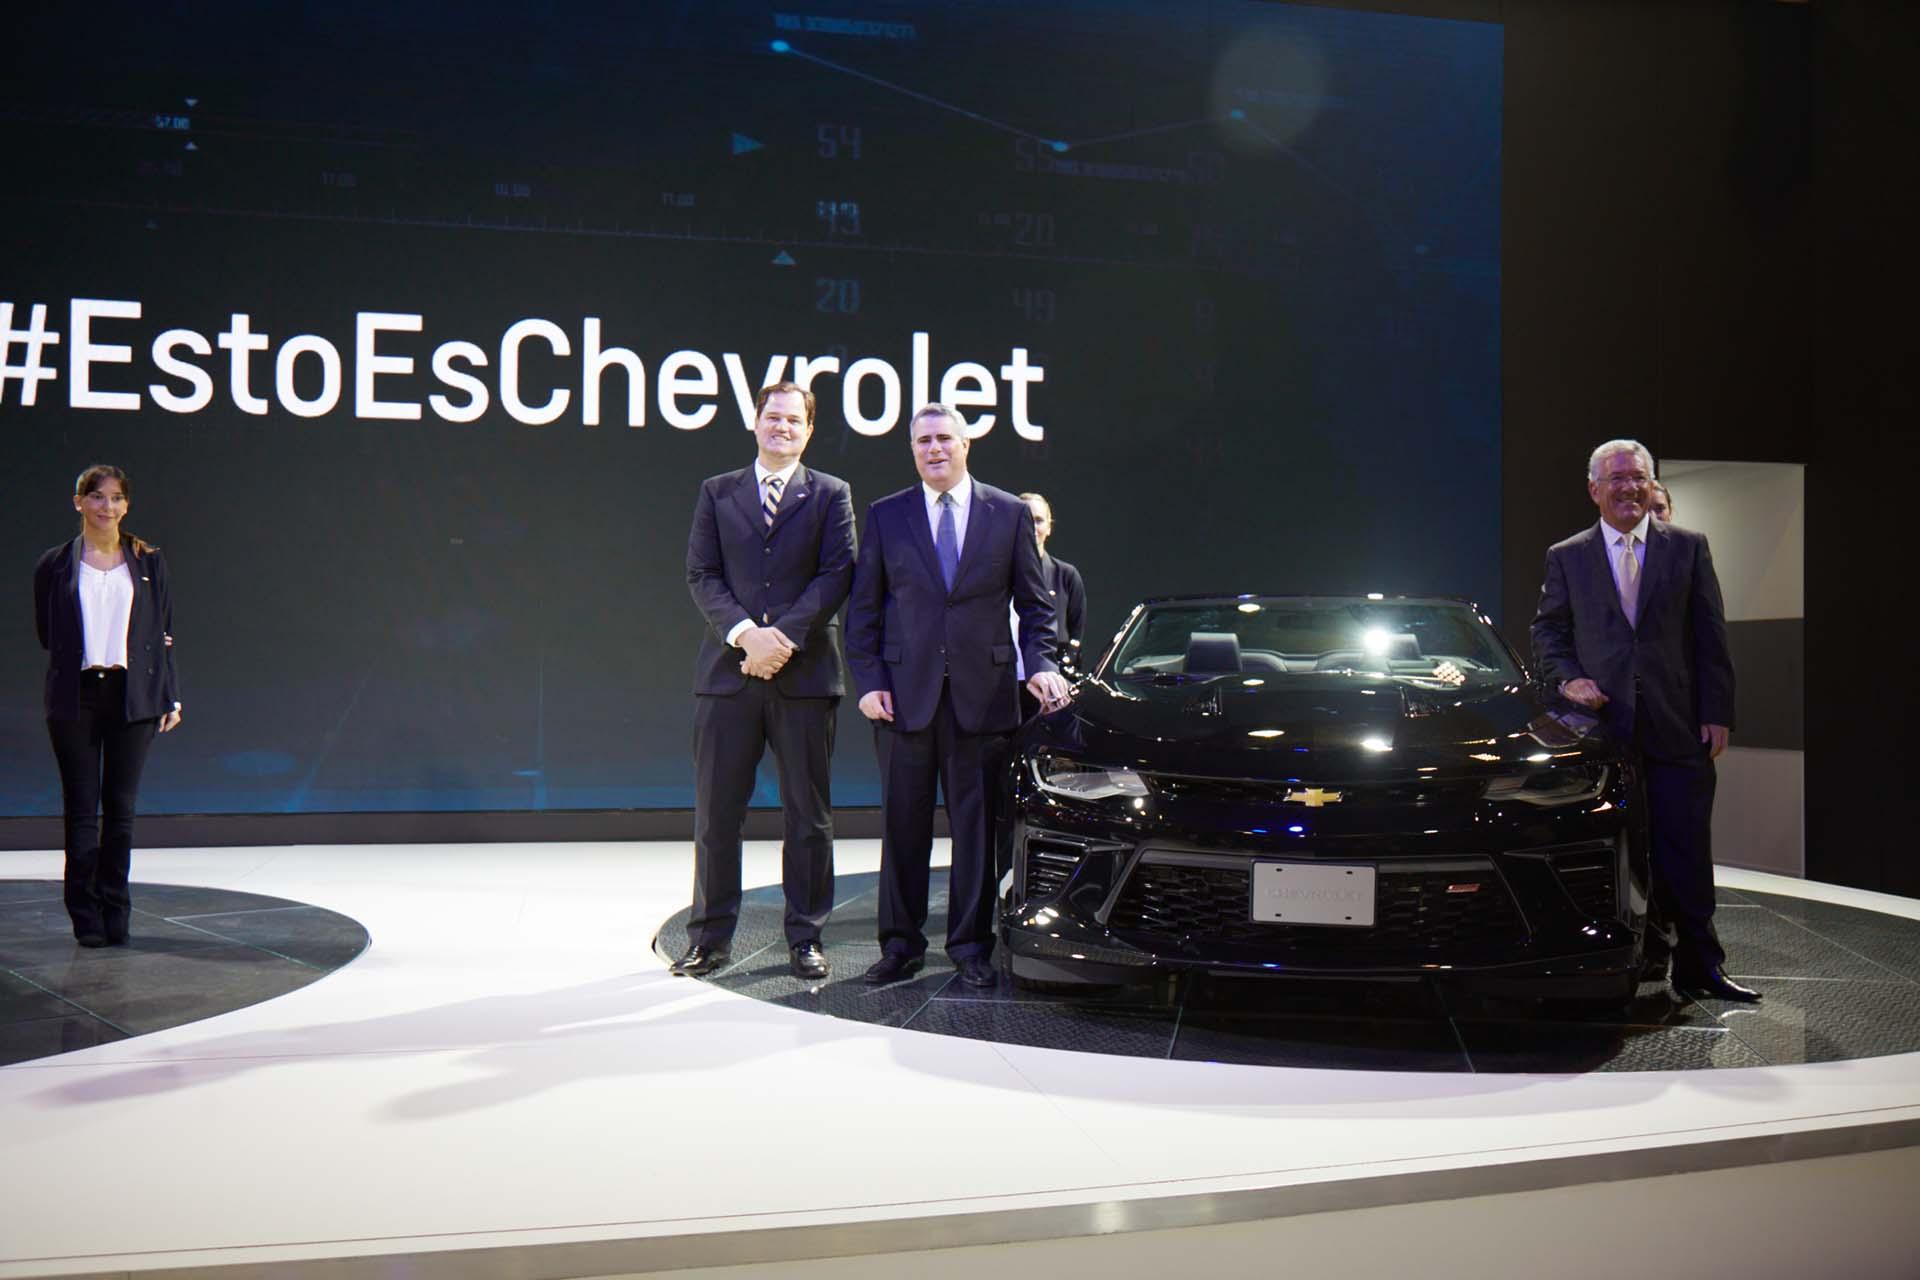 Hermann Mahnke, Carlos Zarlenga y Marcos Munhoz presentando las novedades de Chevrolet. (GM)